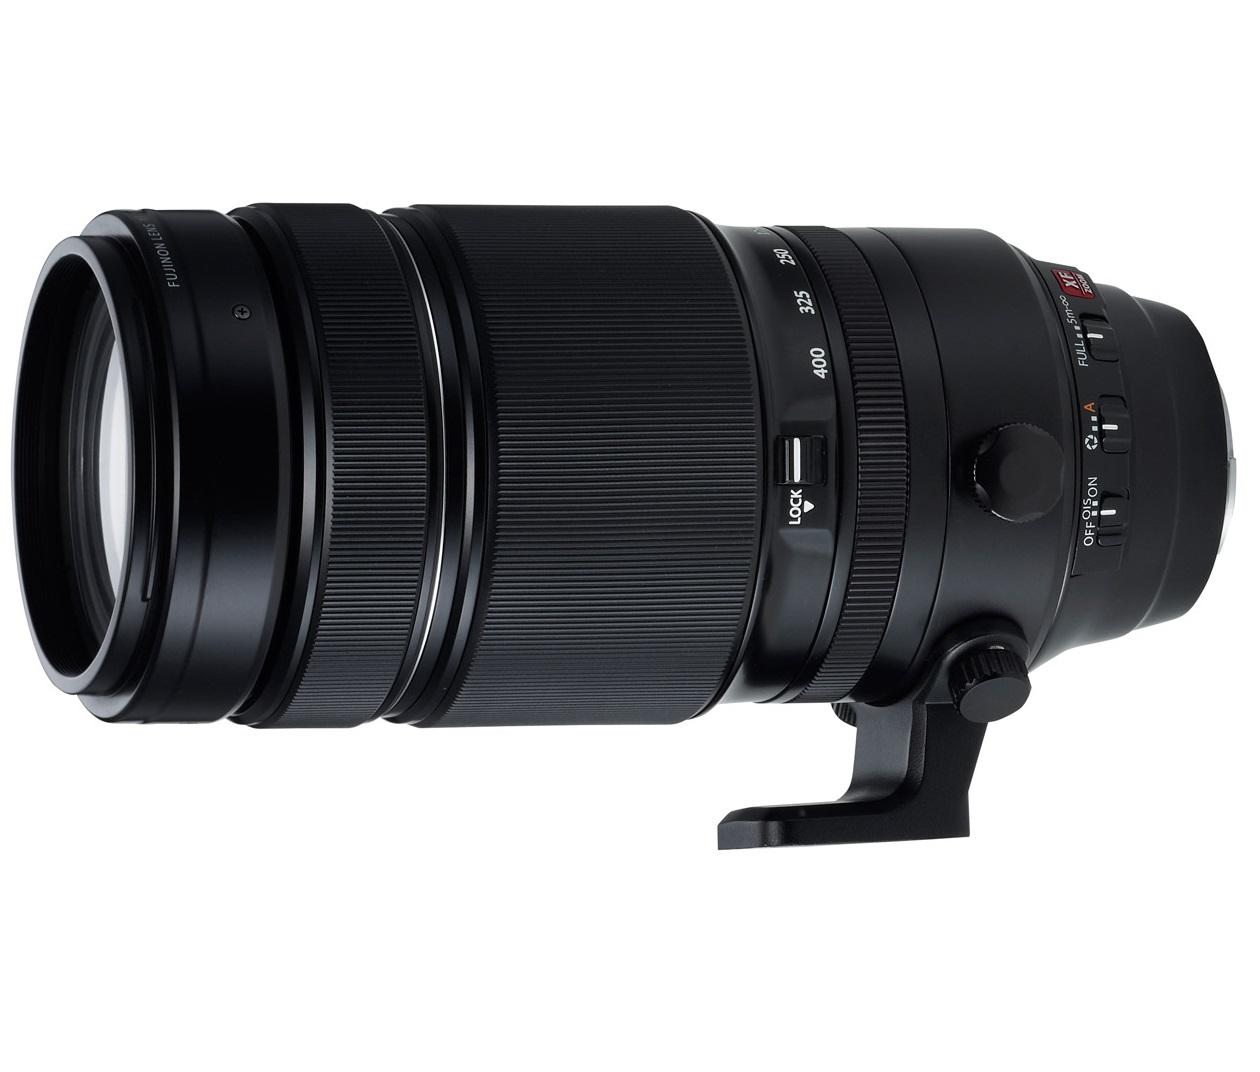 FUJIFILM анонсировала выпуск супер-телеобъектива FUJINON XF100-400mm F4.5-5.6 R LM OIS WR